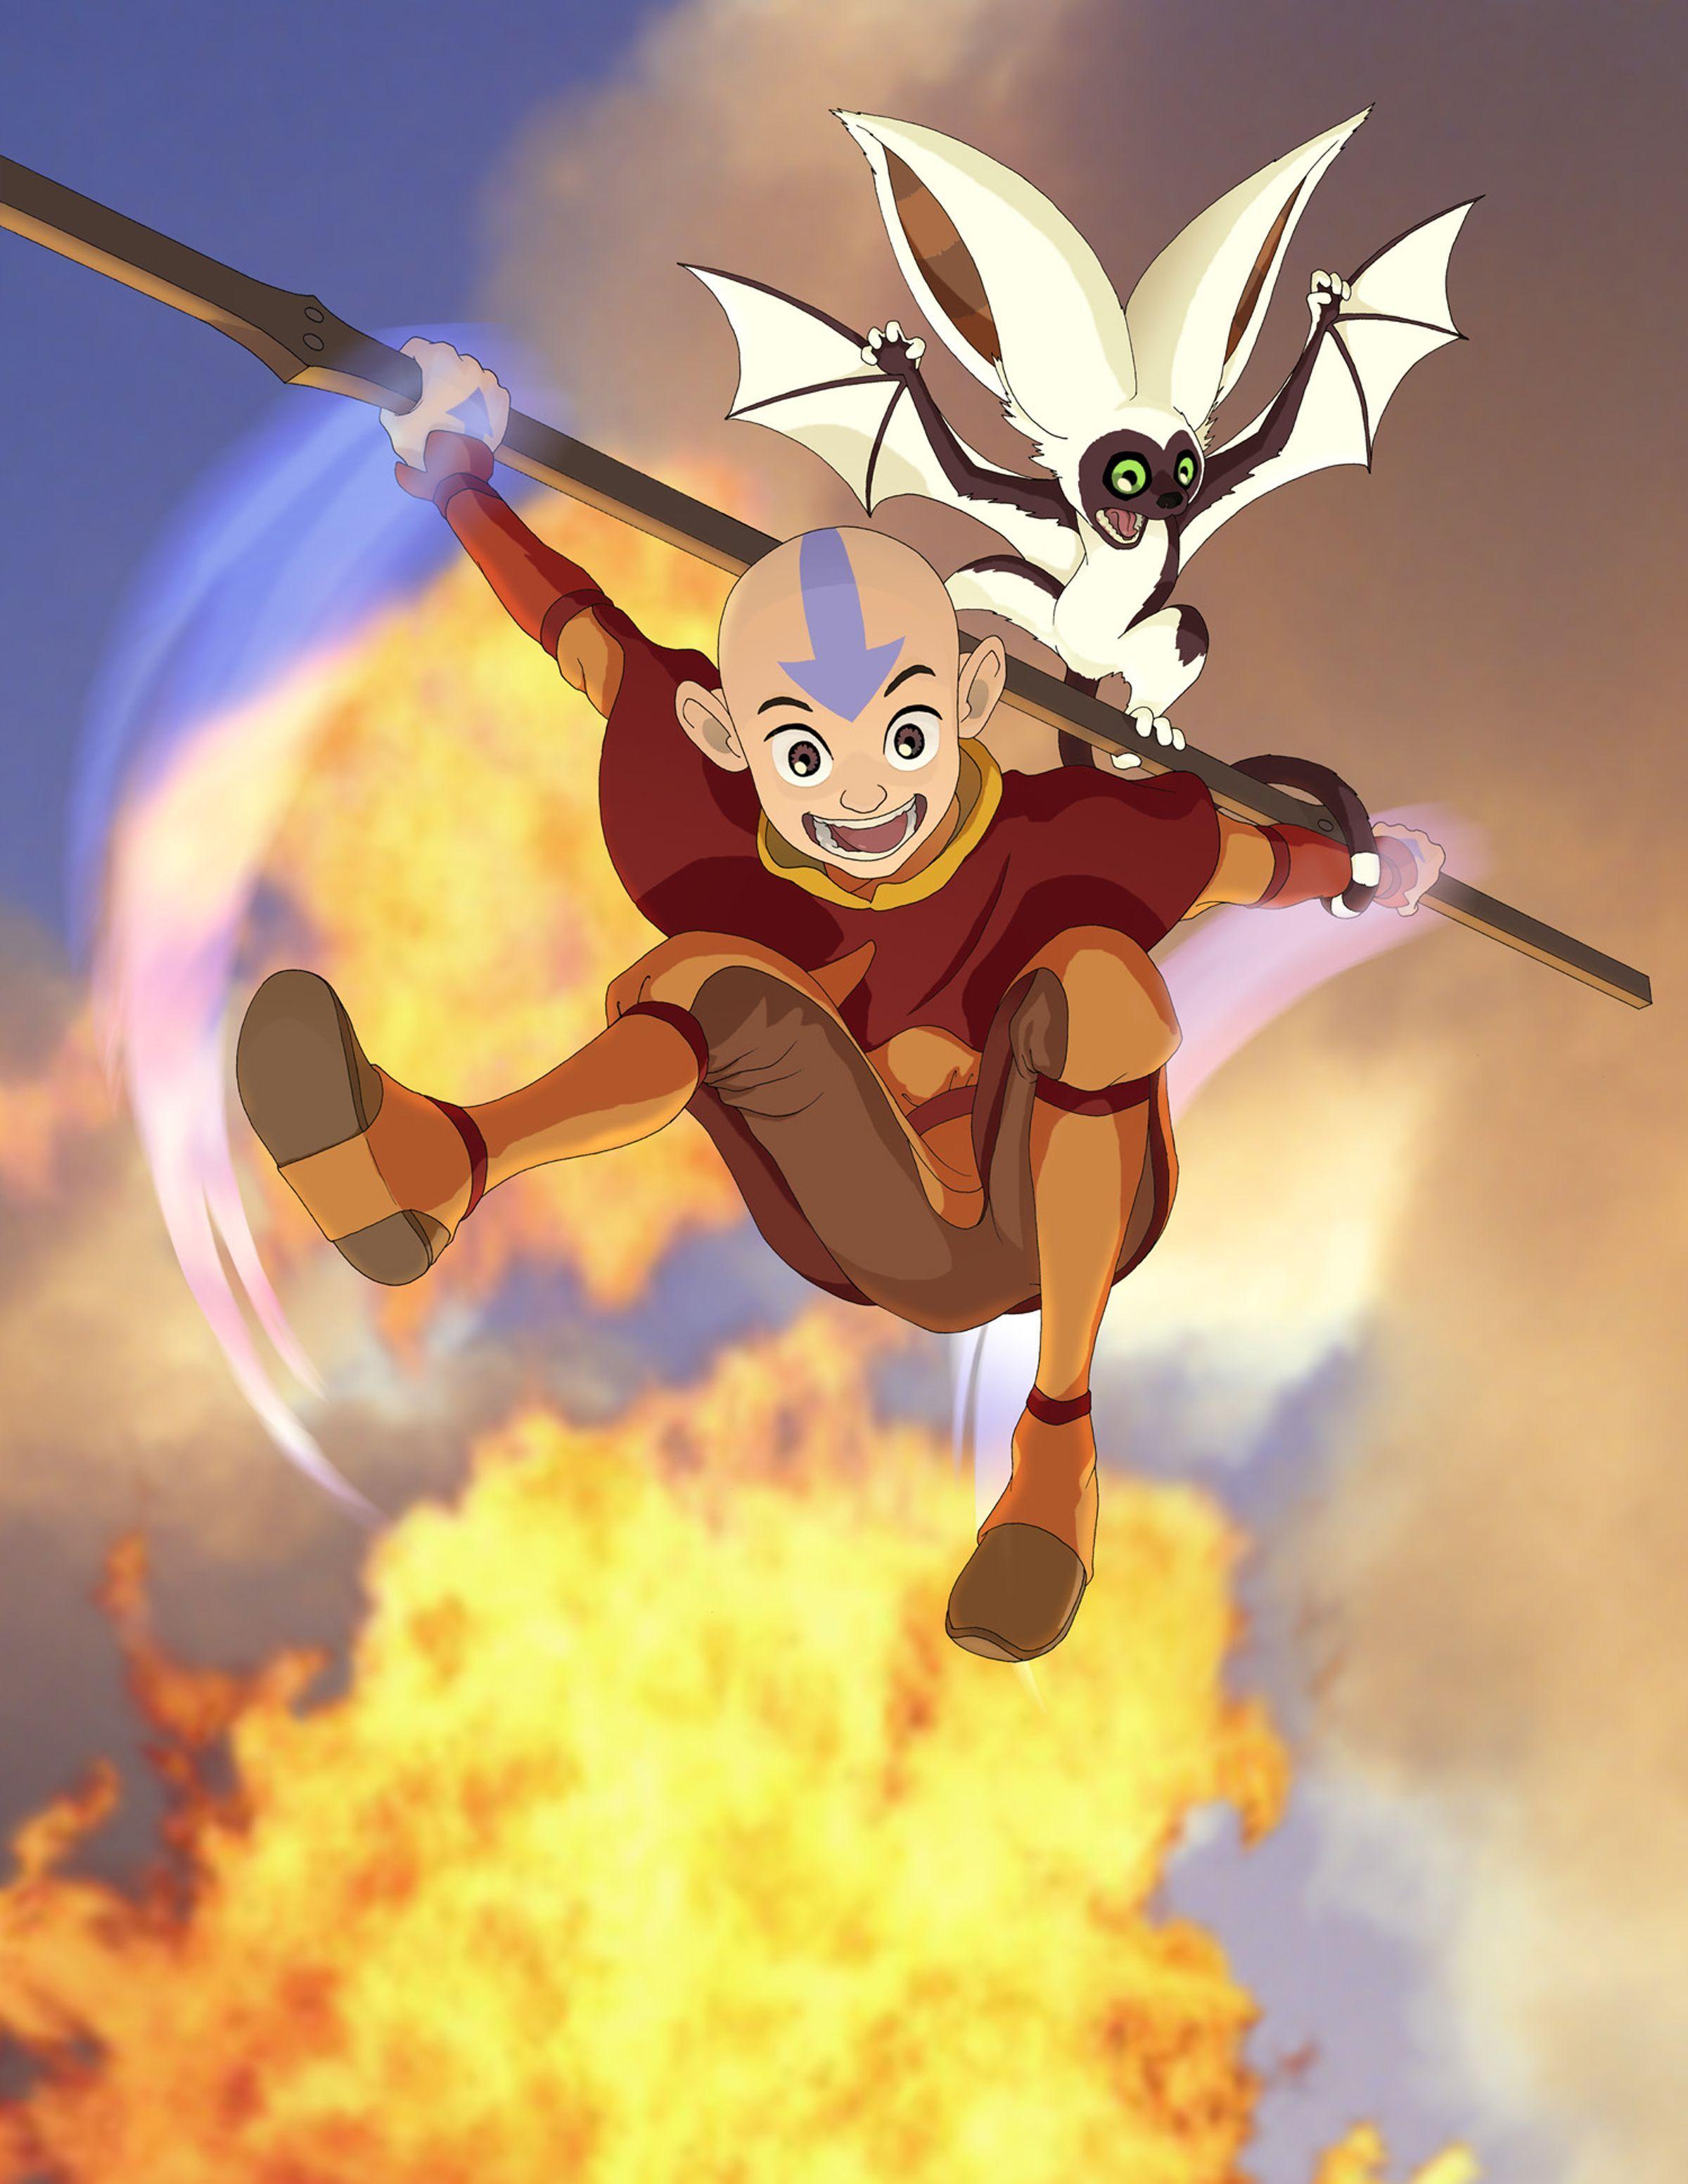 Avatar The Last Airbender Unaired Pilot Watch Online : avatar, airbender, unaired, pilot, watch, online, Nickelodeon, Released, Original,